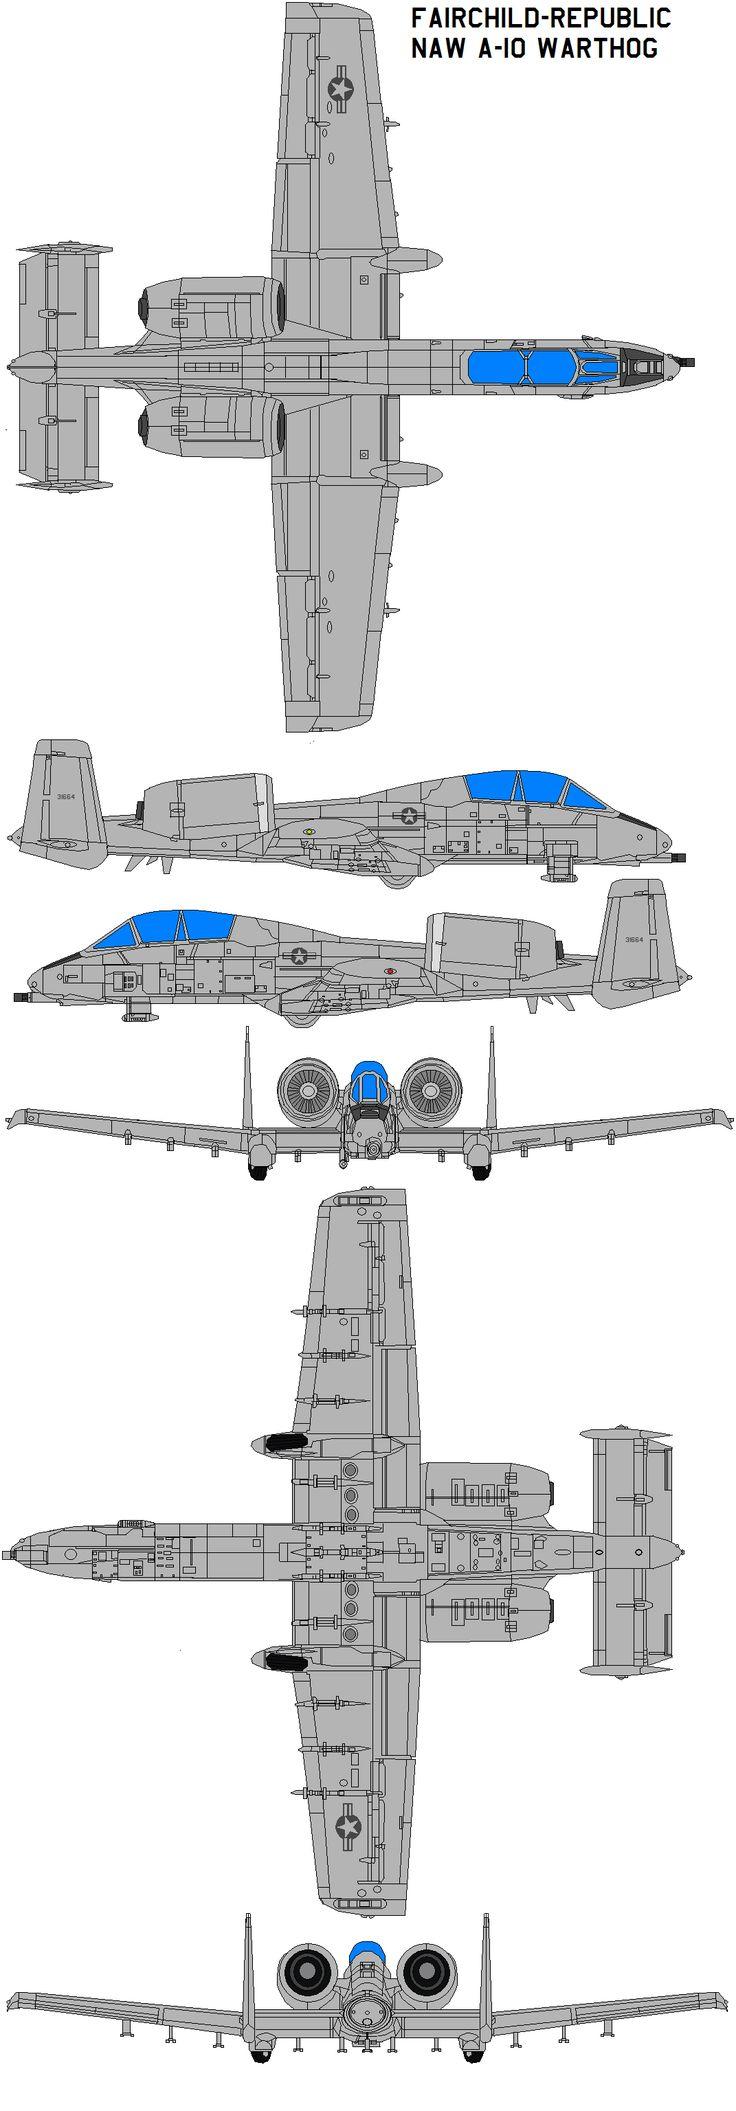 Fairchild NAW A-10 Warthog by bagera3005.deviantart.com on @deviantART